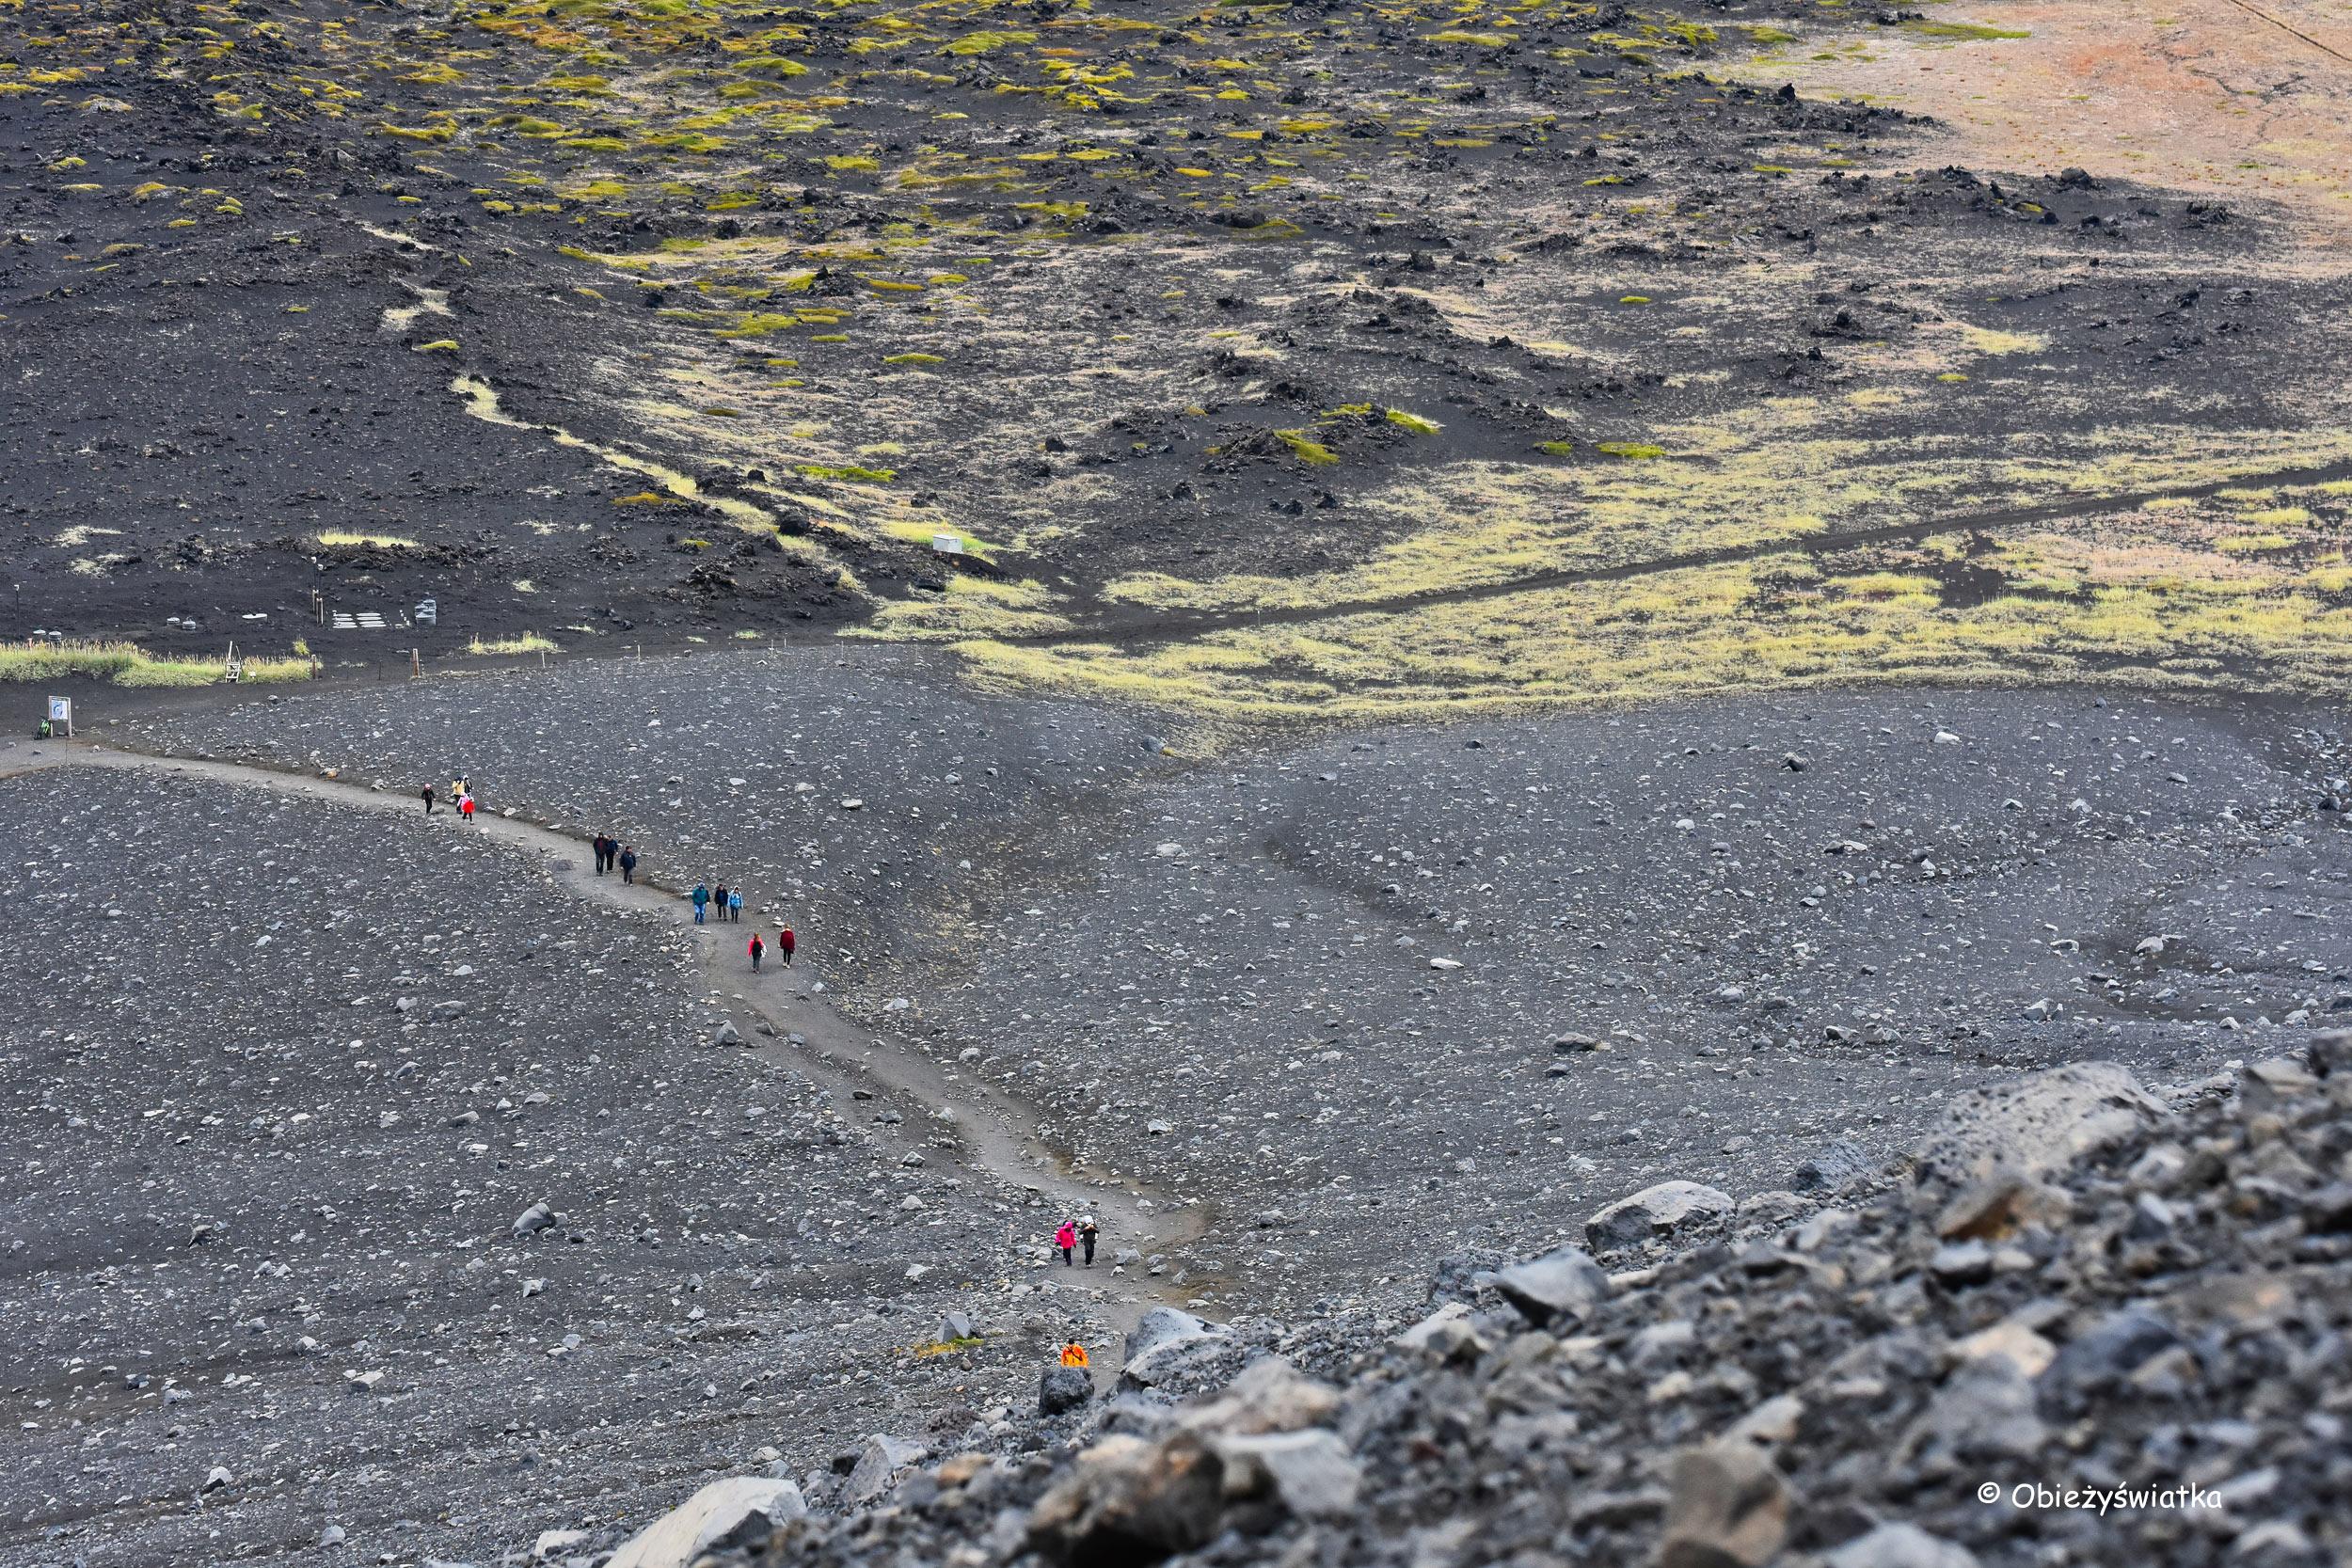 Ścieżka na wulkan Hverfjall, Islandia